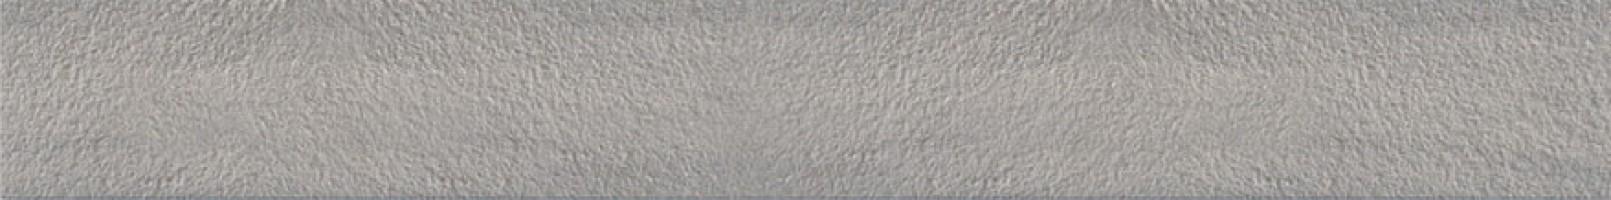 Подступенок Venatto Texture Tabica Grain Dolmen 15x120